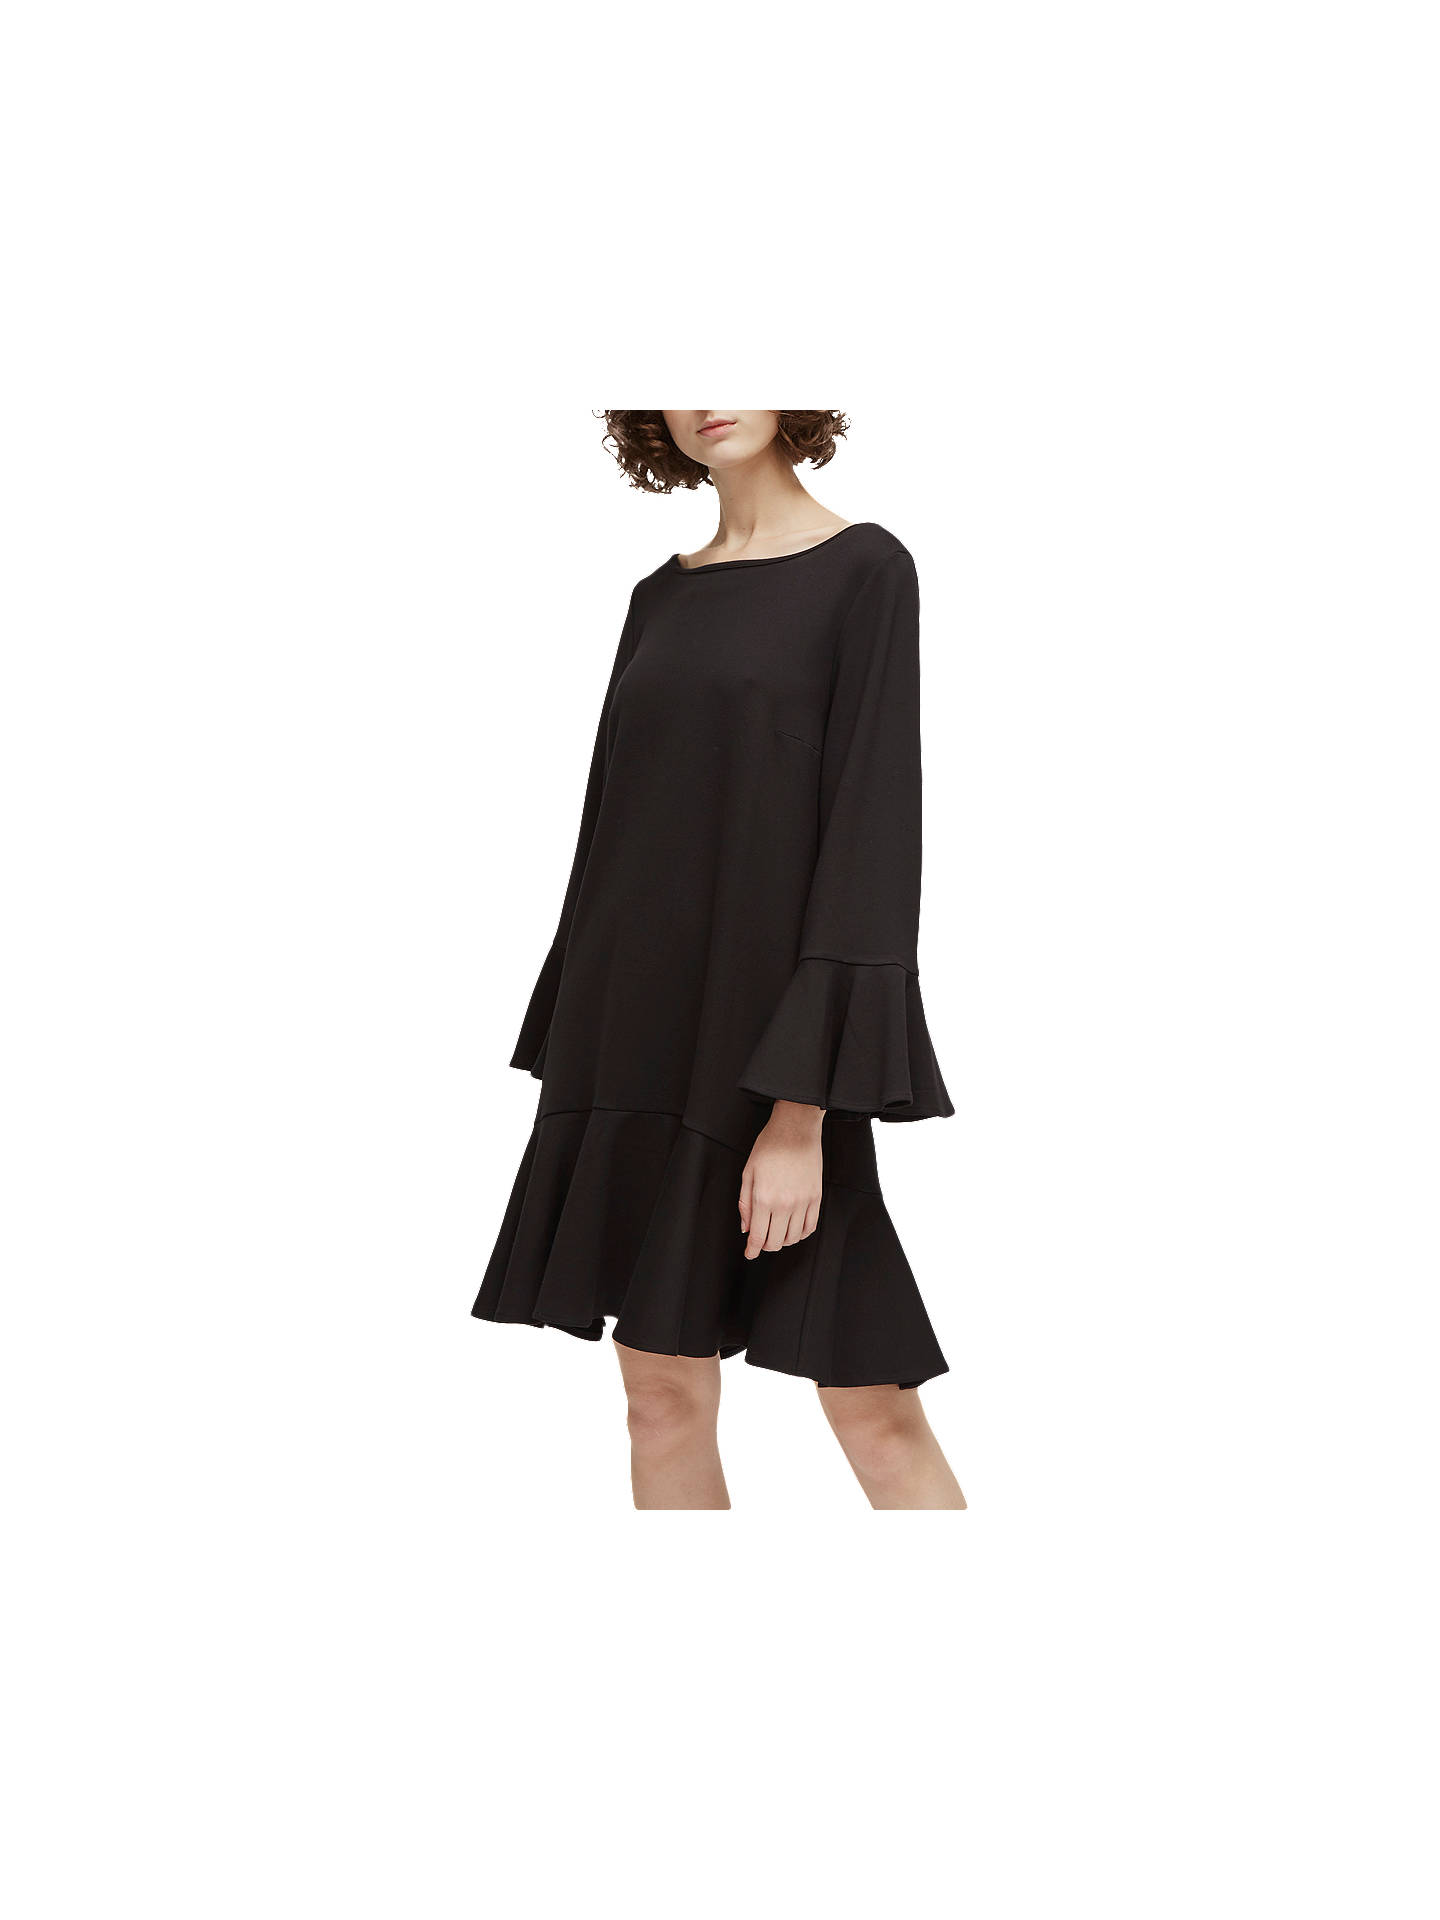 f98759ec243 Buy French Connection Matuku Lula Bell Sleeve Jersey Dress